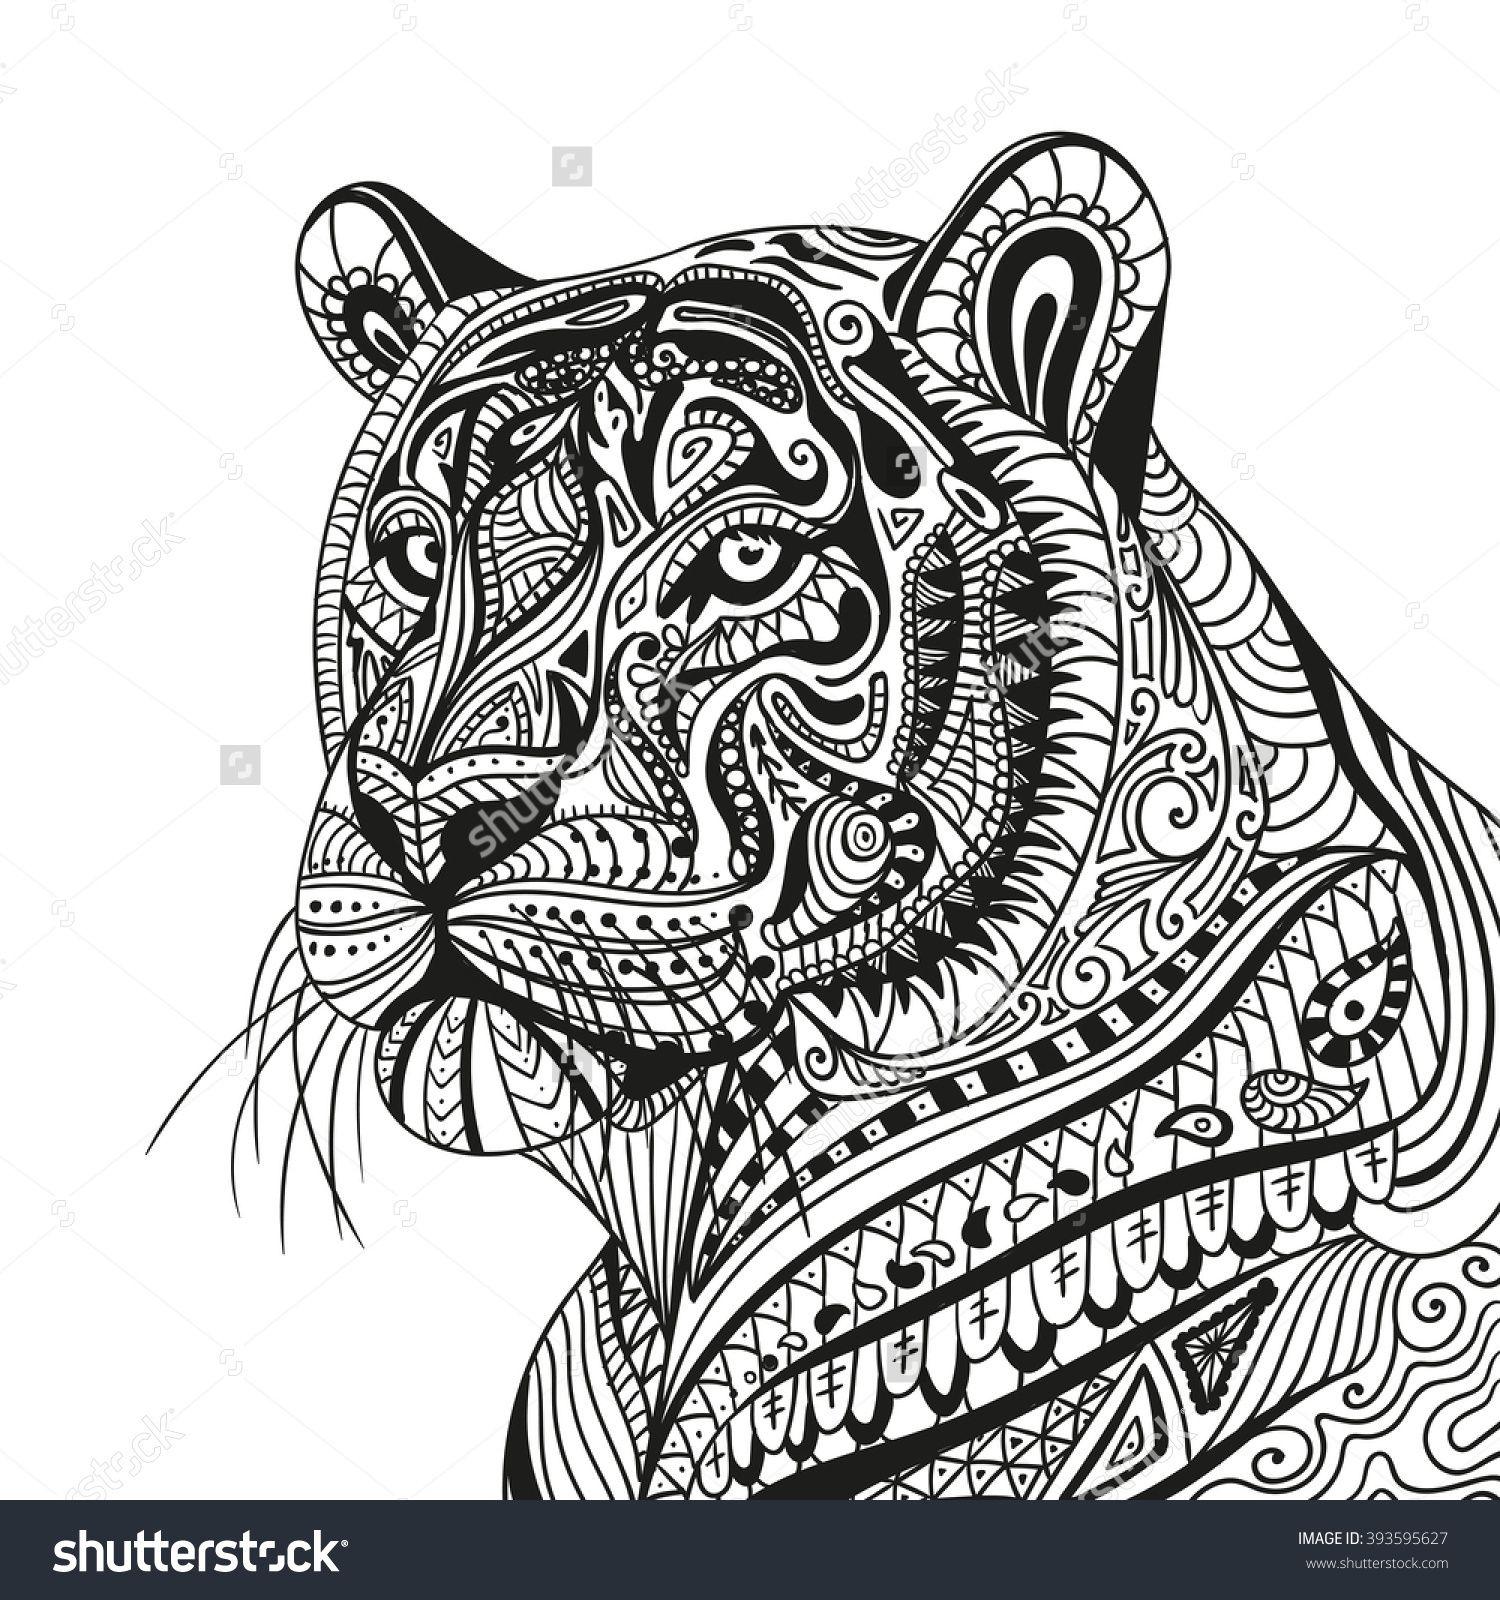 Vector Illustration Of An Abstract Ornamental Tiger In 2020 Mandala Coloring Animal Wall Decals Mandala Coloring Pages